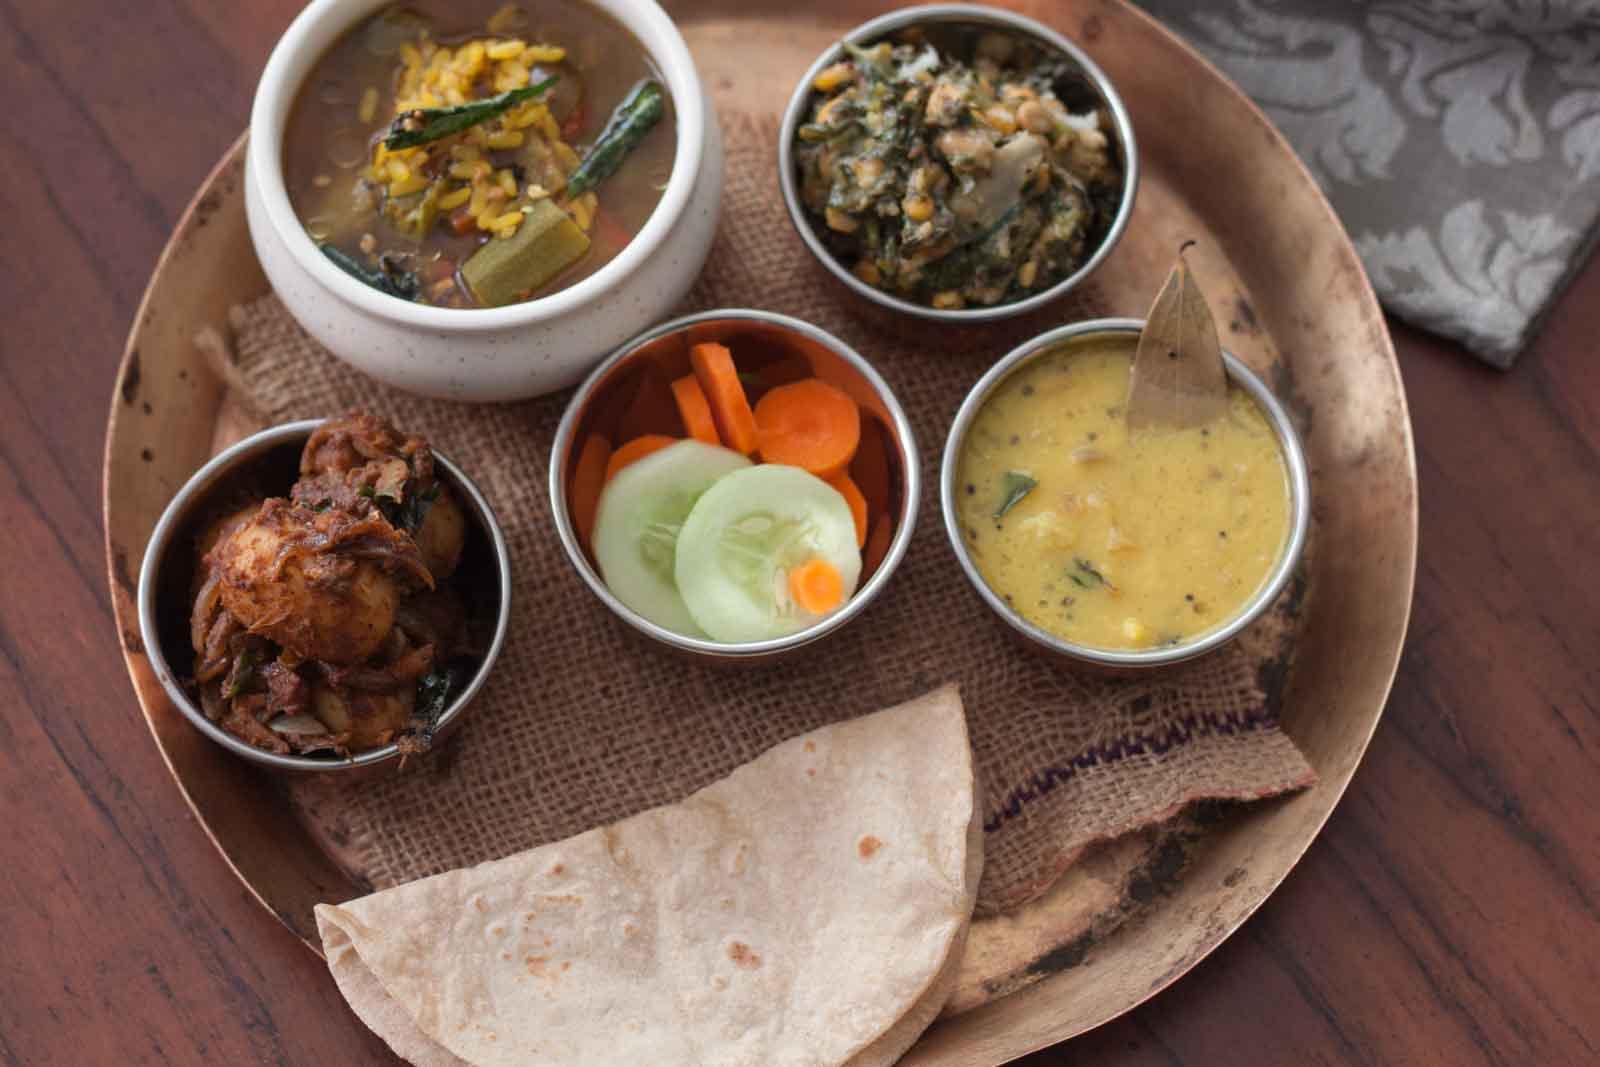 Everyday meal platevendakayu charu aloochi bhajiurali roast everyday meal platevendakayu charu aloochi bhajiurali roastphulka salad forumfinder Gallery